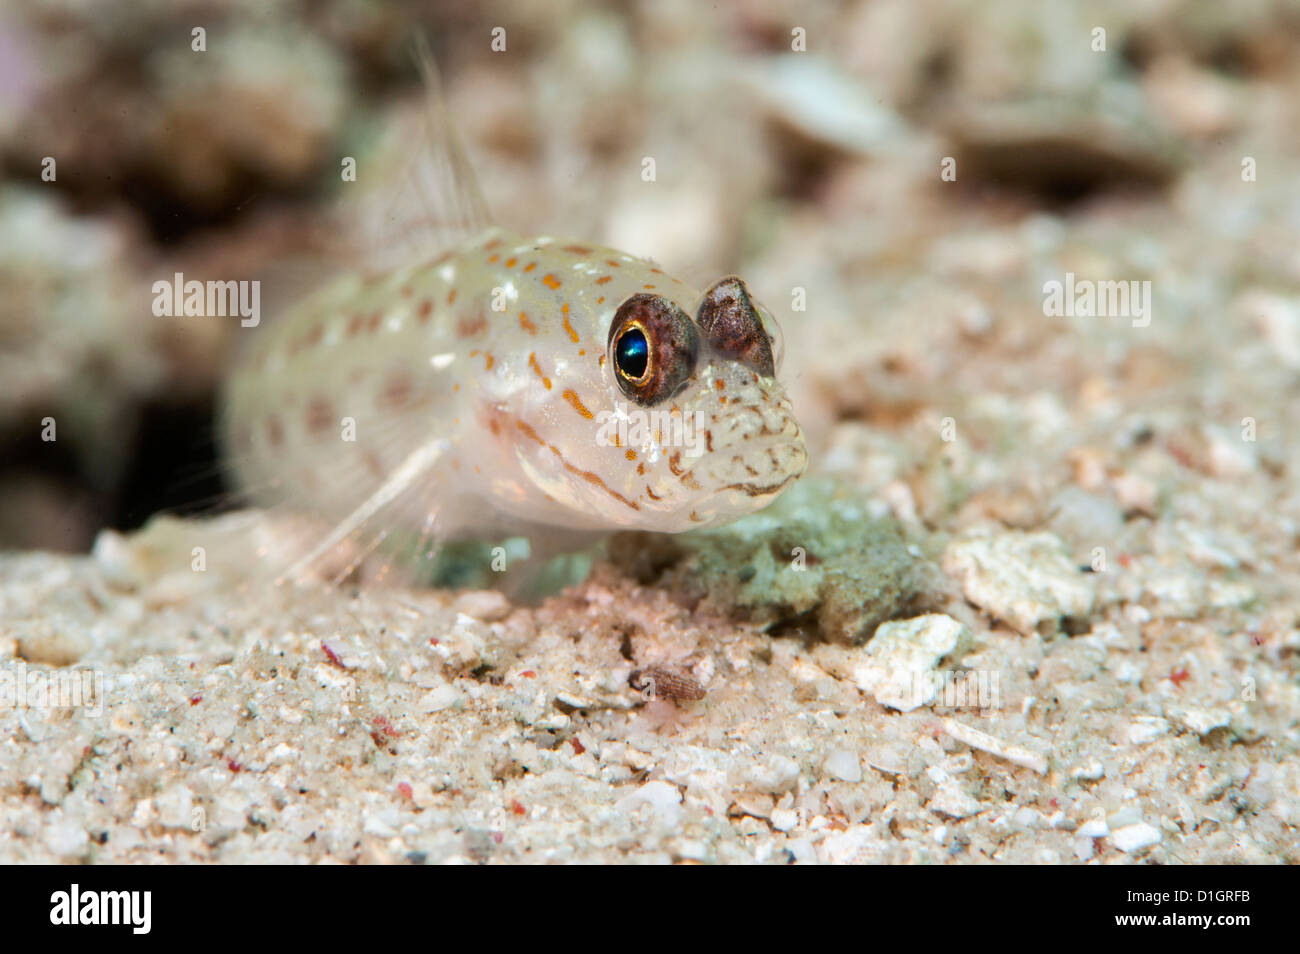 Gold speckled shrimp goby (Ctenogobiops pomastictus), Sulawesi, Indonesia, Southeast Asia, Asia - Stock Image